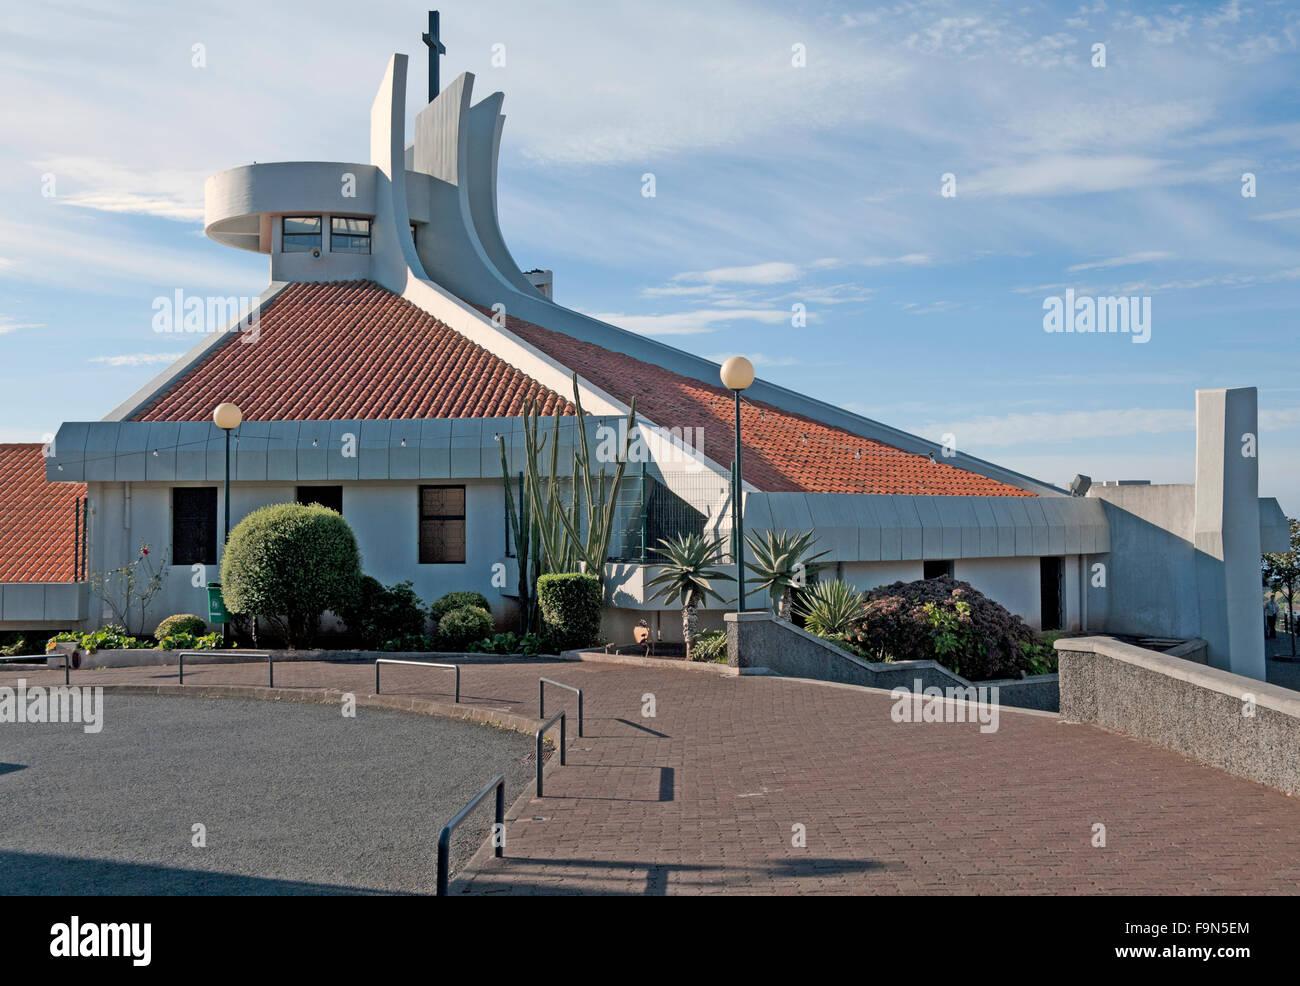 Camacha, Igreja Paroquial Da Camacha Church, Madeira, Portugal, - Stock Image